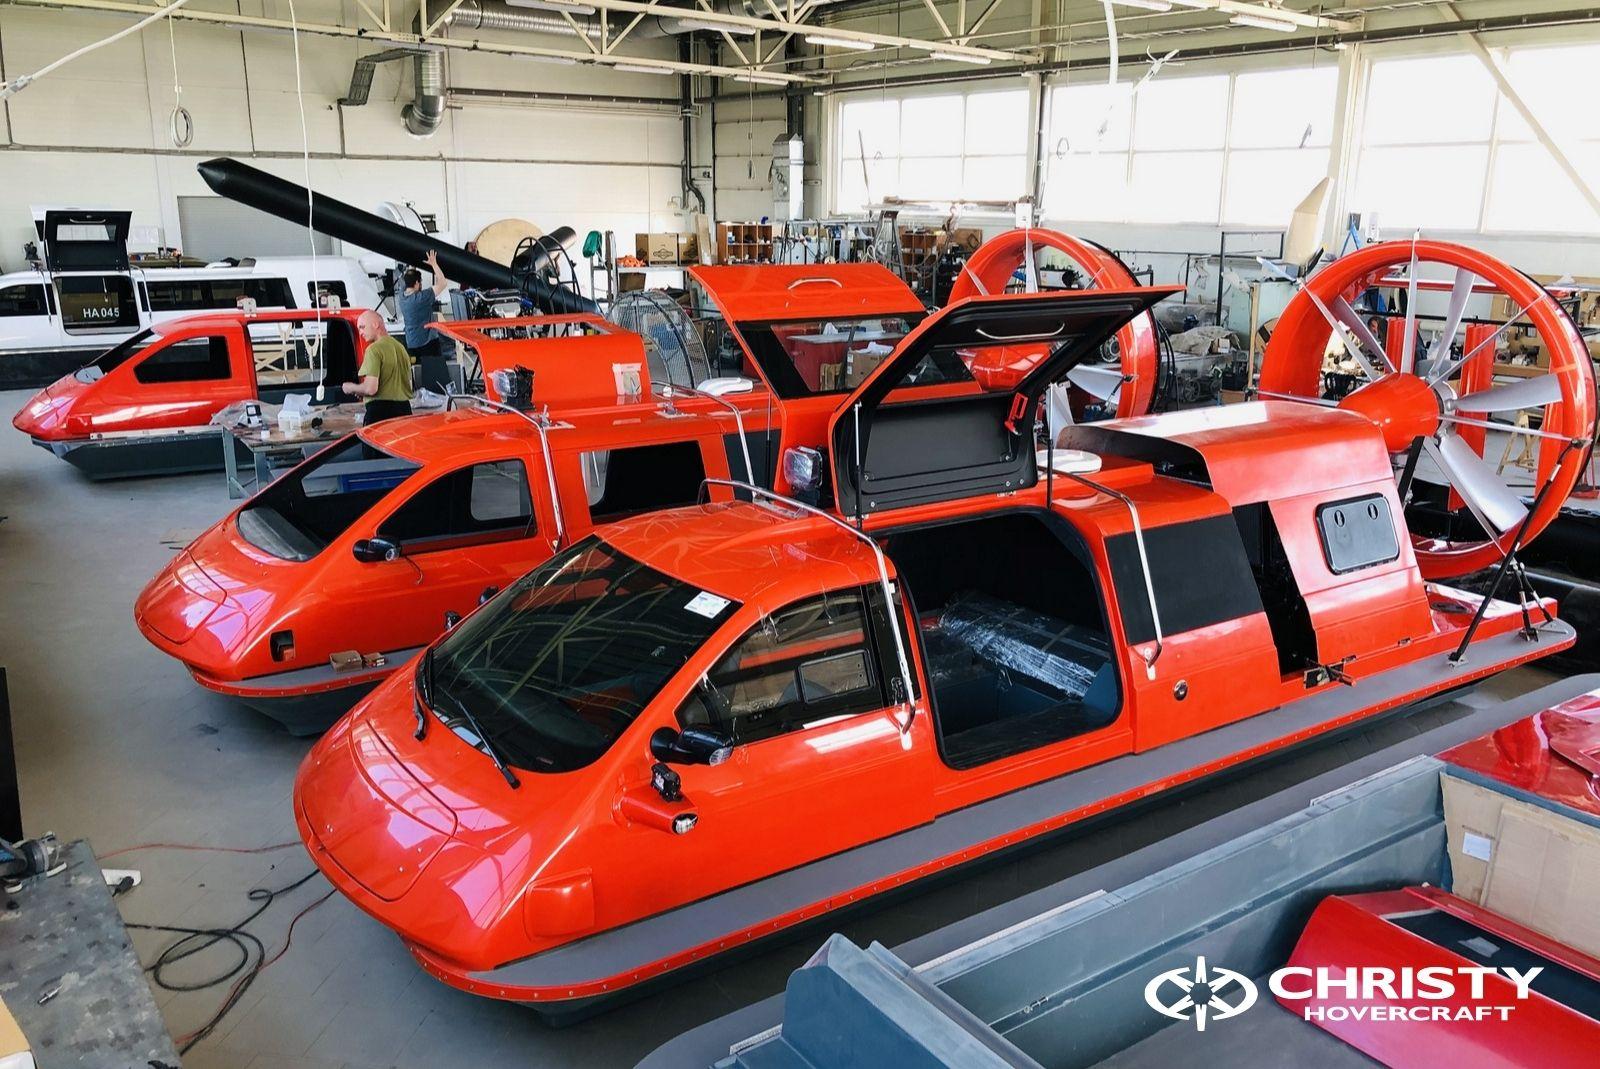 Тест-драйв катера-амфибии Christy 8186 FC Duct для правительства Канады   фото №6